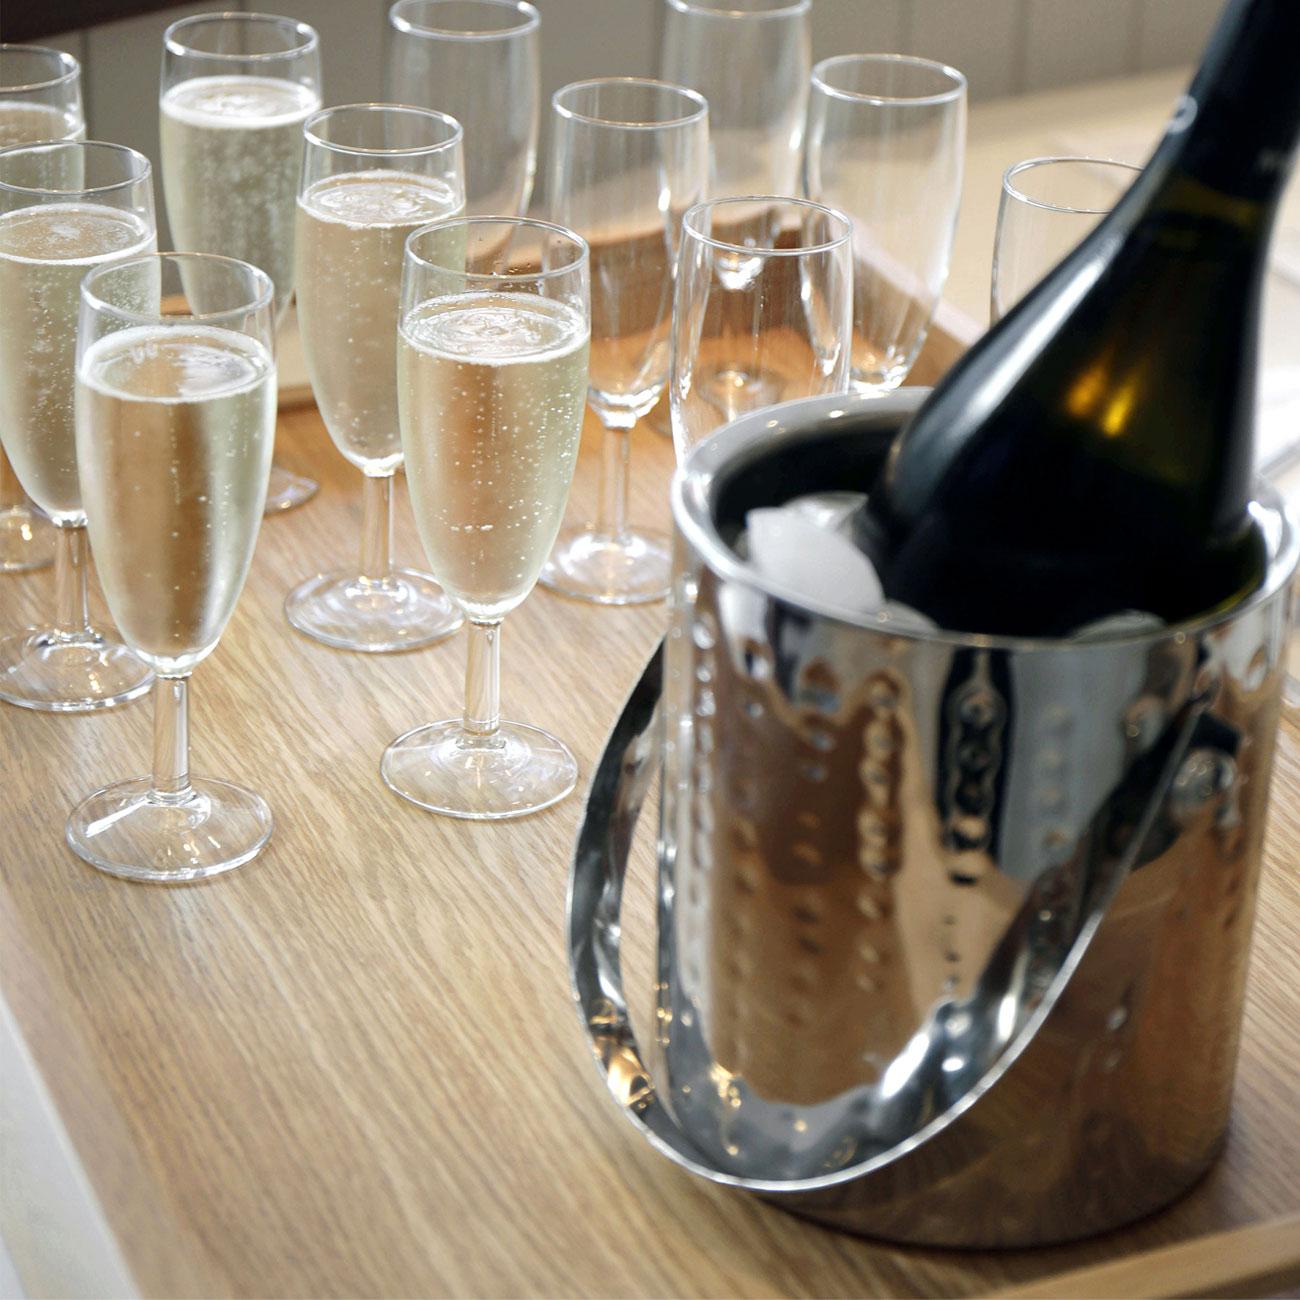 Kitchen Design Tunbridge Wells: Royal Tunbridge Wells Anniversary Event With Chef Nigel